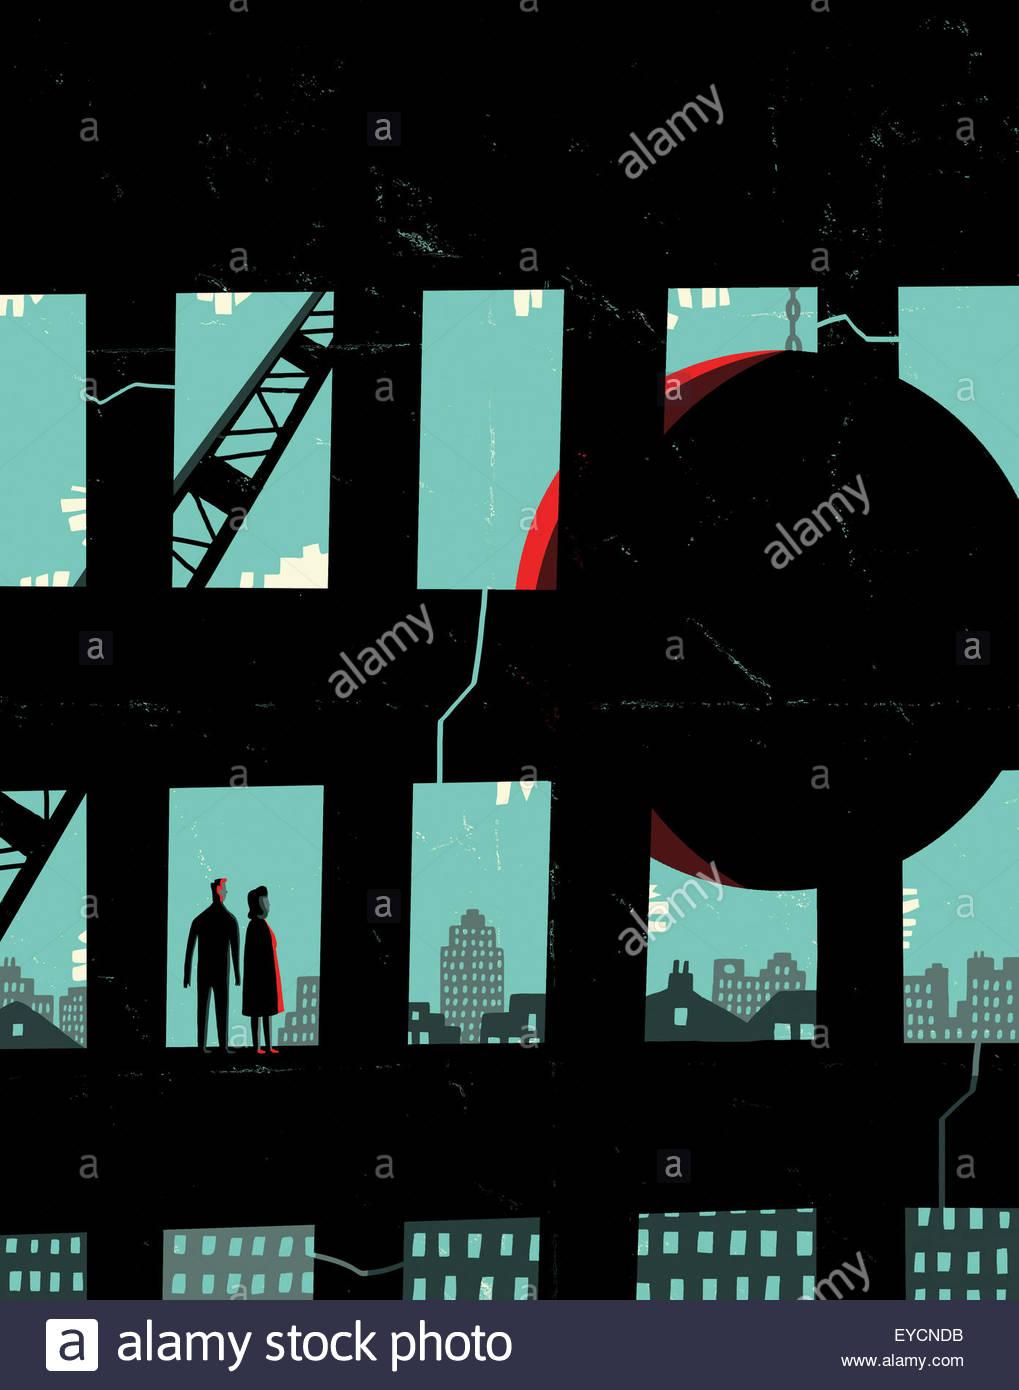 Couple watching wrecking ball demolishing highrise building - Stock Image